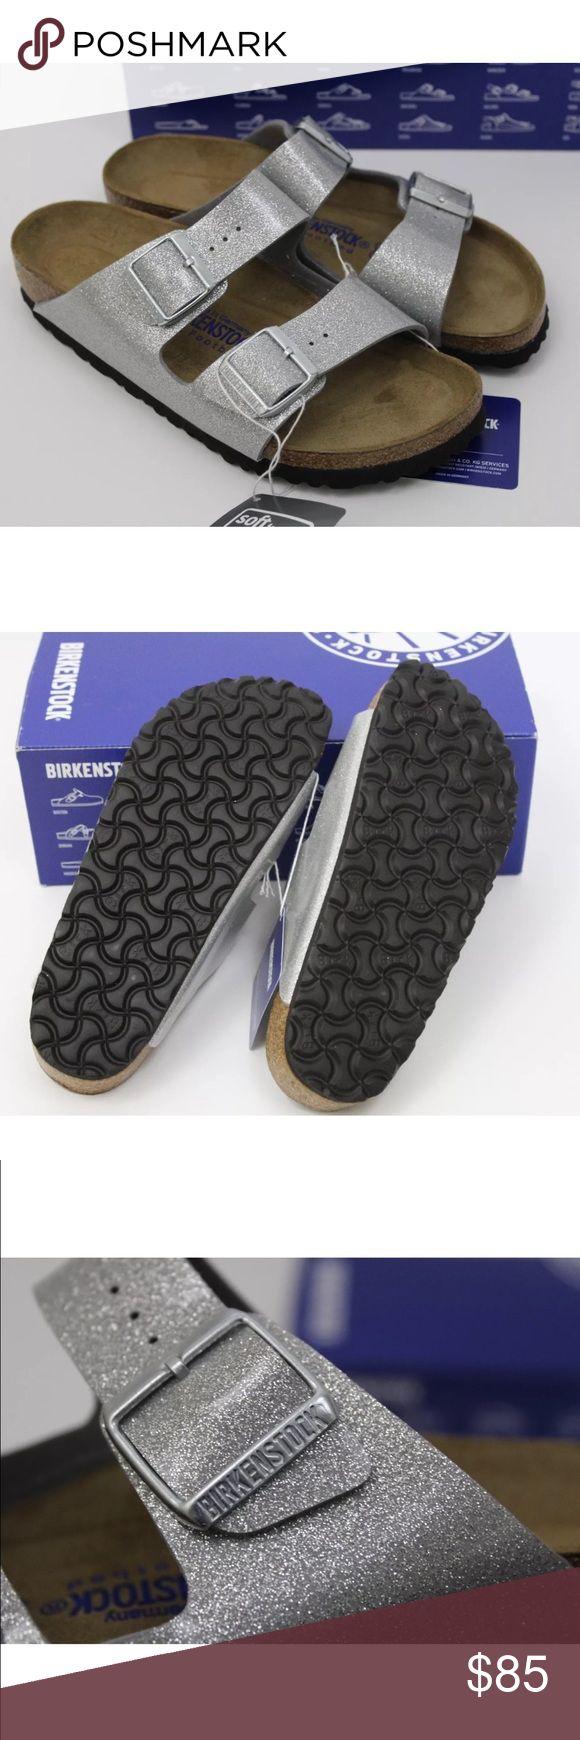 Birkenstock 37 Magic Galaxy Silver Glitter Arizona Size 37. Soft footbed. Narrow width. New in box Birkenstock Shoes Sandals